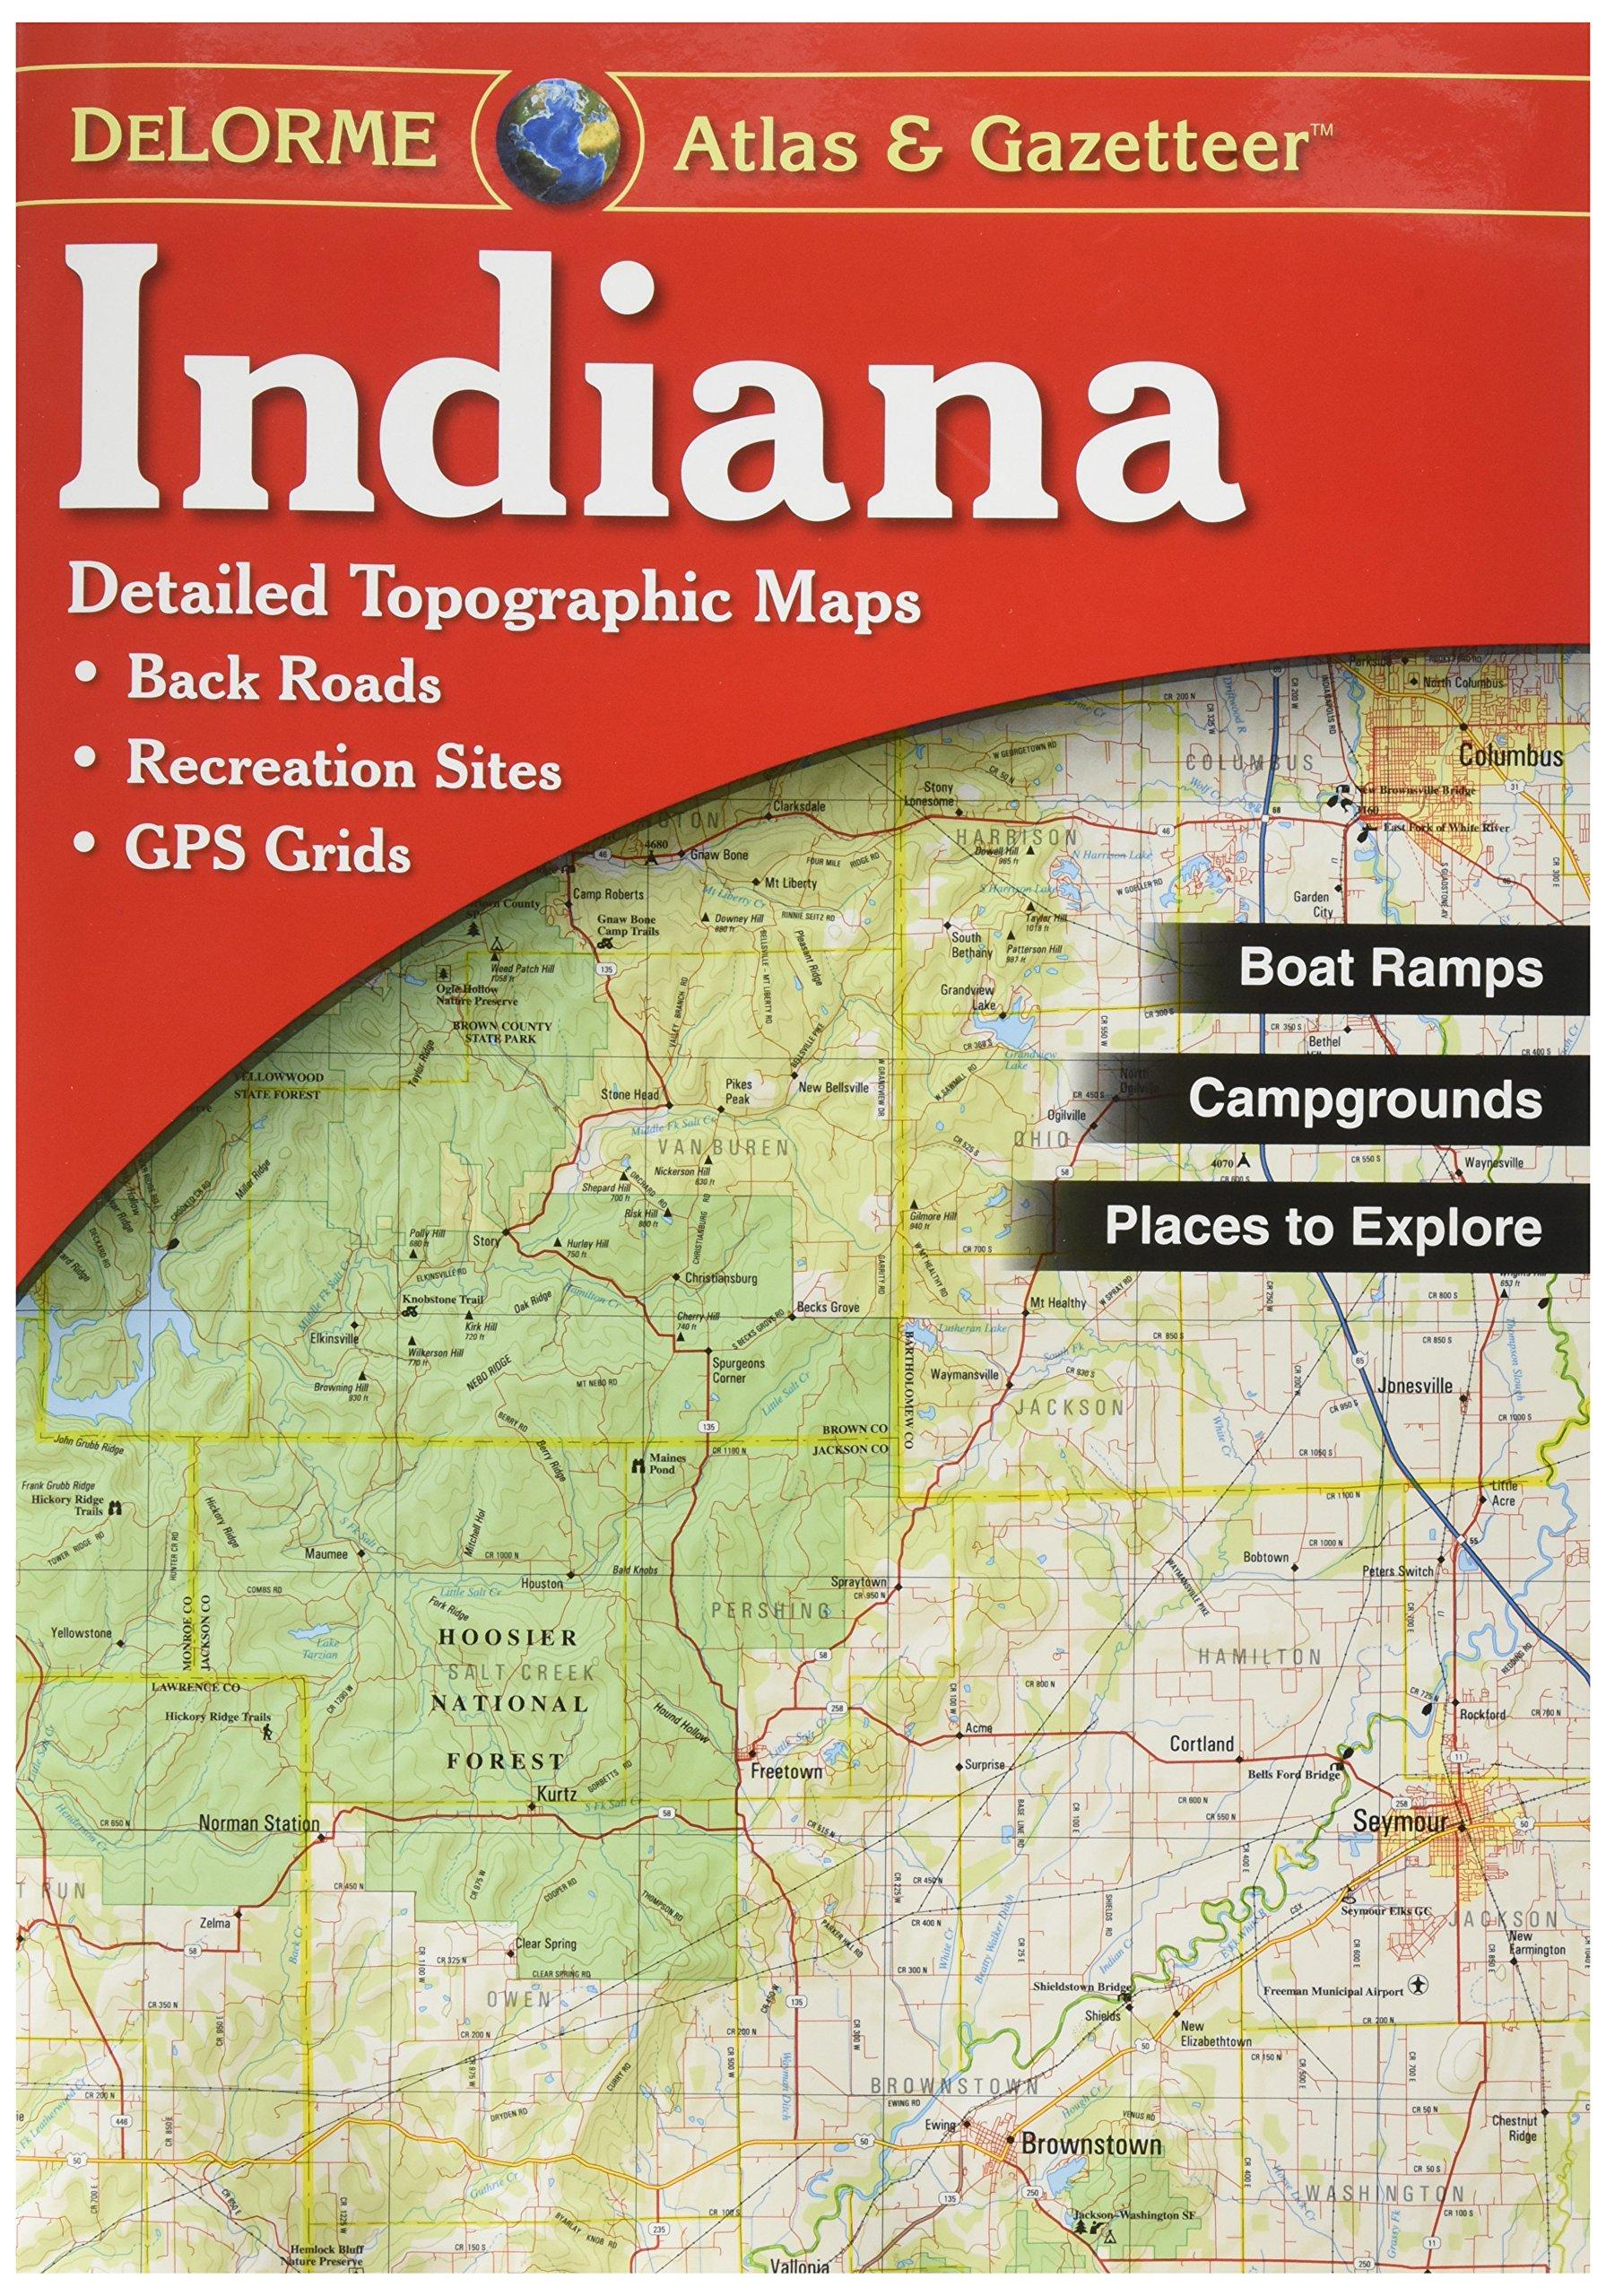 Garmin DeLorme Atlas & Gazetteer Paper Maps- Indiana, AA-001383-000